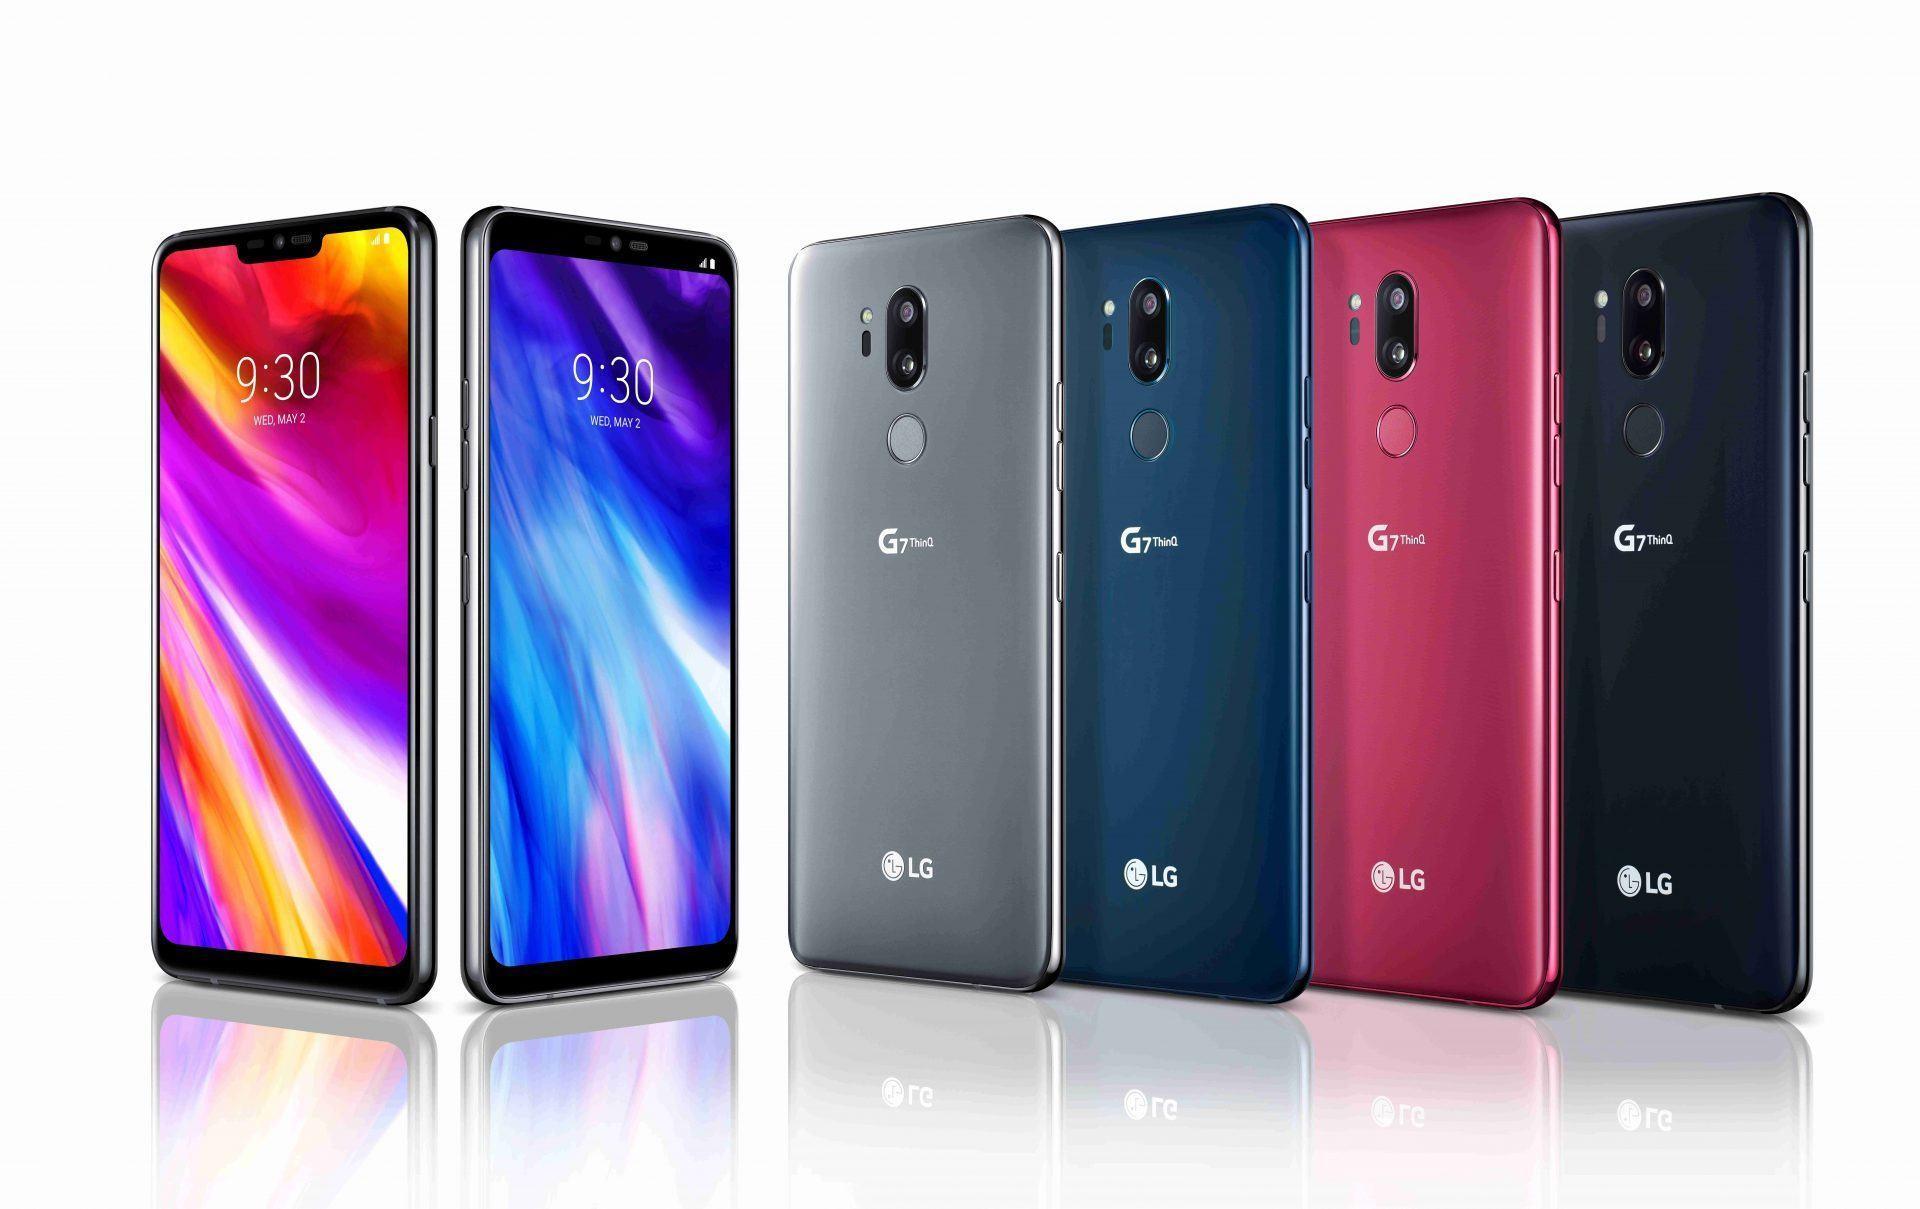 LG G7 - Wann kommt der nächste Flop der Südkoreaner? 18 techboys.de • smarte News, auf den Punkt! LG G7 - Wann kommt der nächste Flop der Südkoreaner?